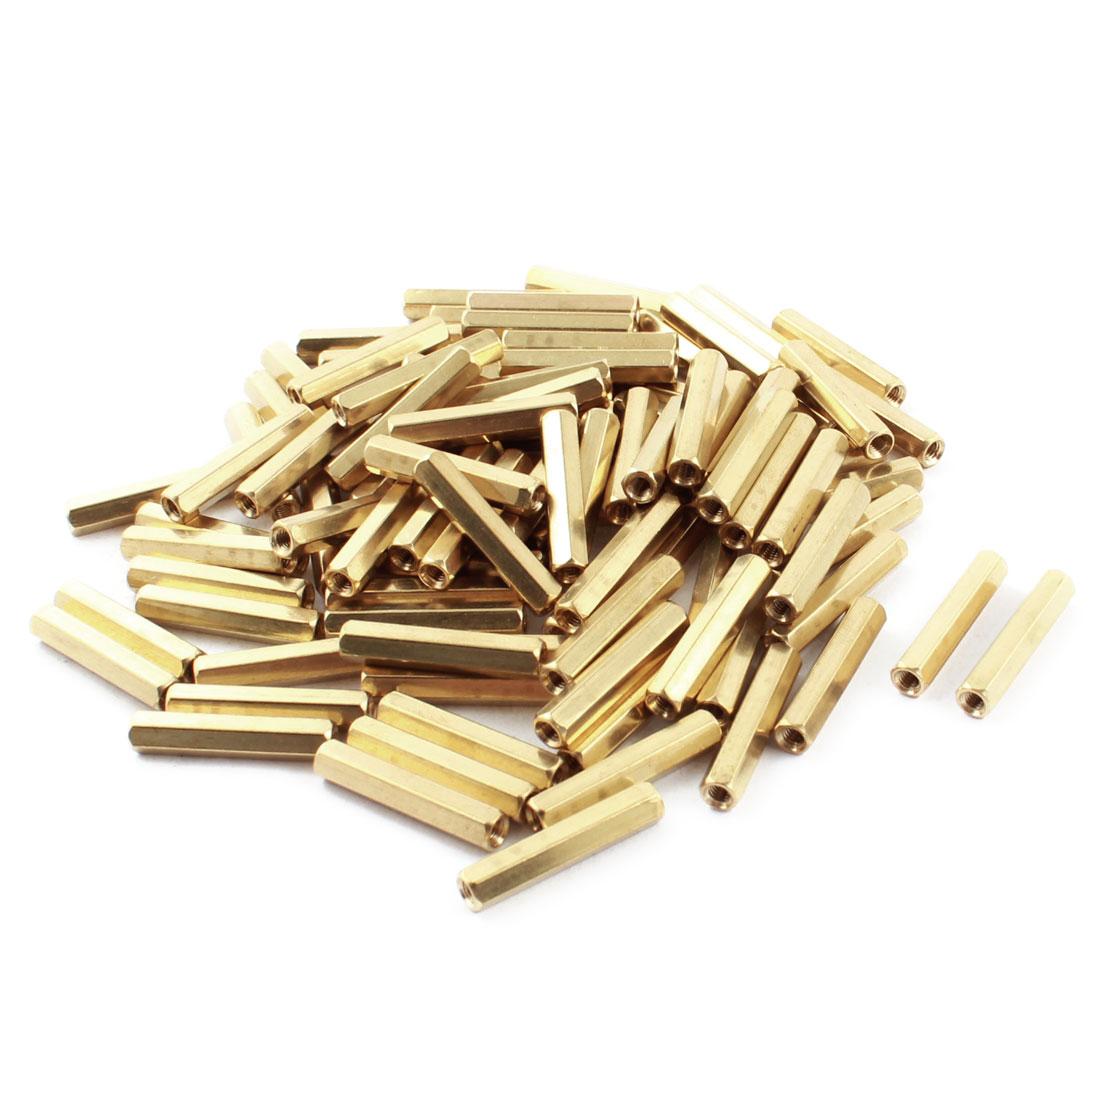 100Pcs Female Thread Dual Ends Gold Tone Brass Pillar PCB Standoff Hexagonal Spacer M3 x 25mm